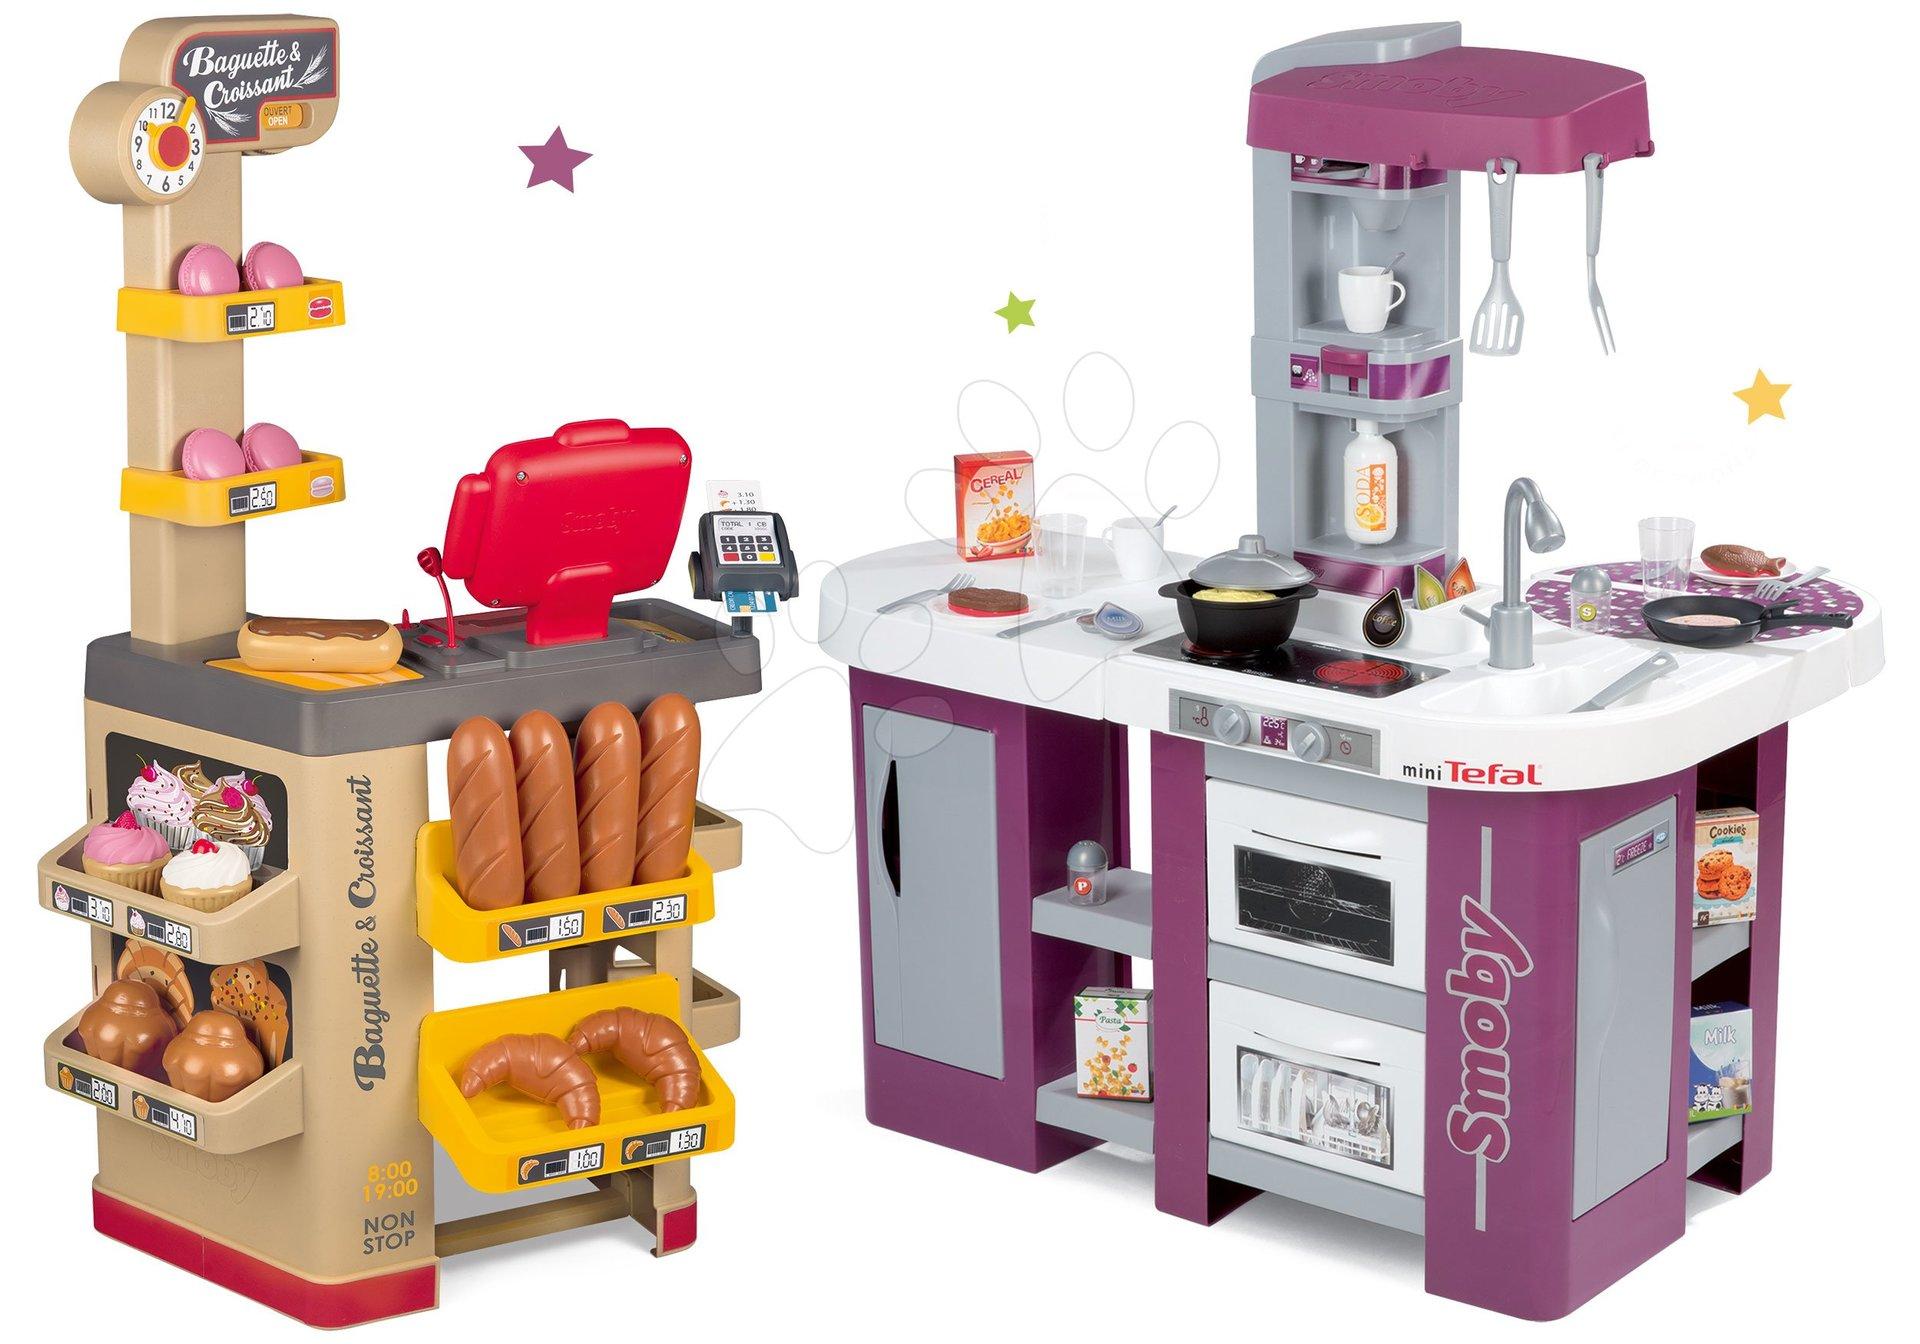 Set pekáreň s koláčmi Baguette&Croissant Bakery Smoby s elektronickou pokladňou a kuchynka elektronická Tefal Studio XL s umývačkou riadu